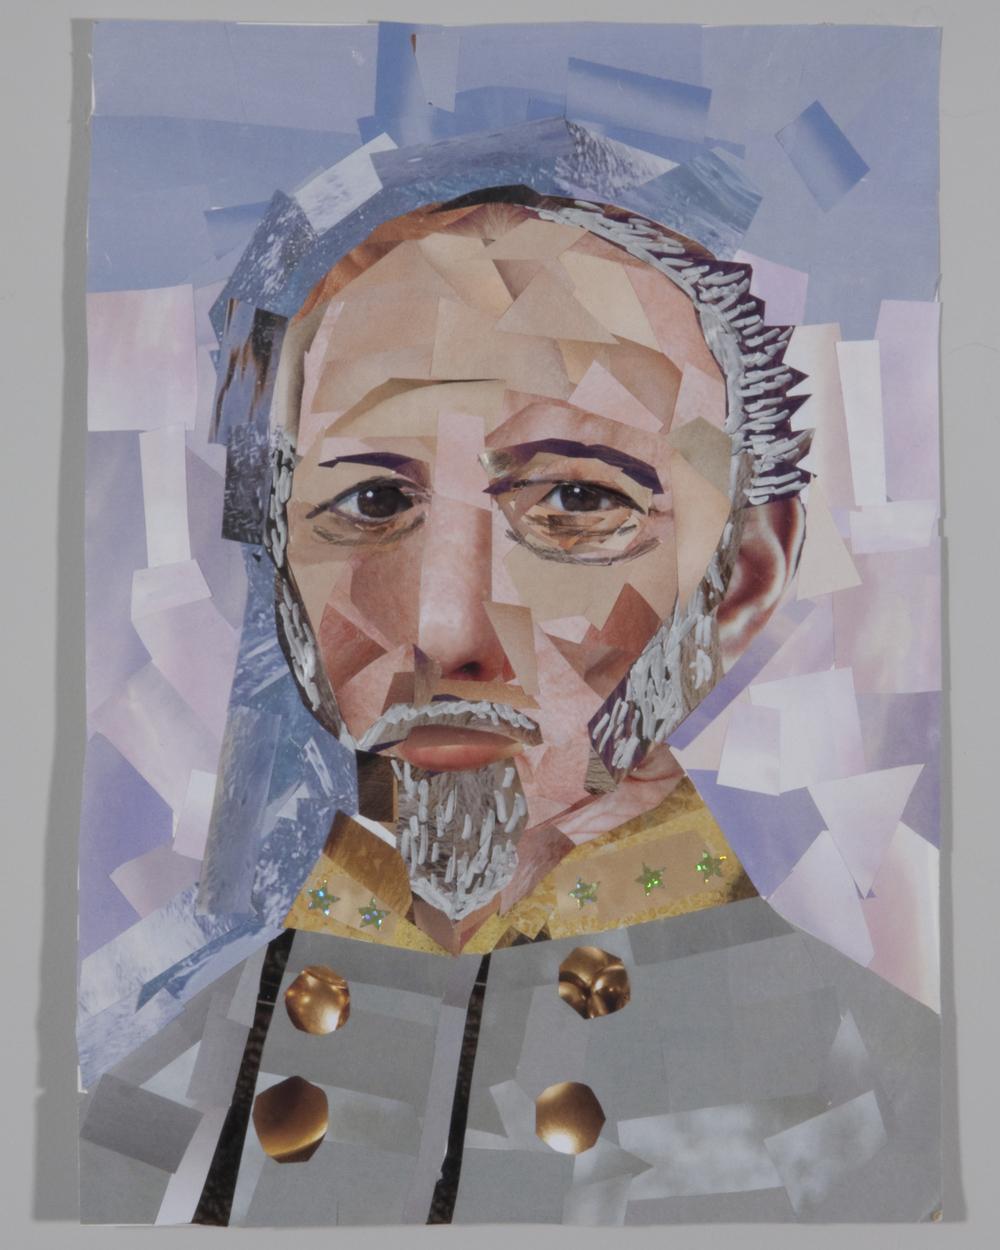 General+Joseph+Johnston+Image+-+2400x3000.jpg